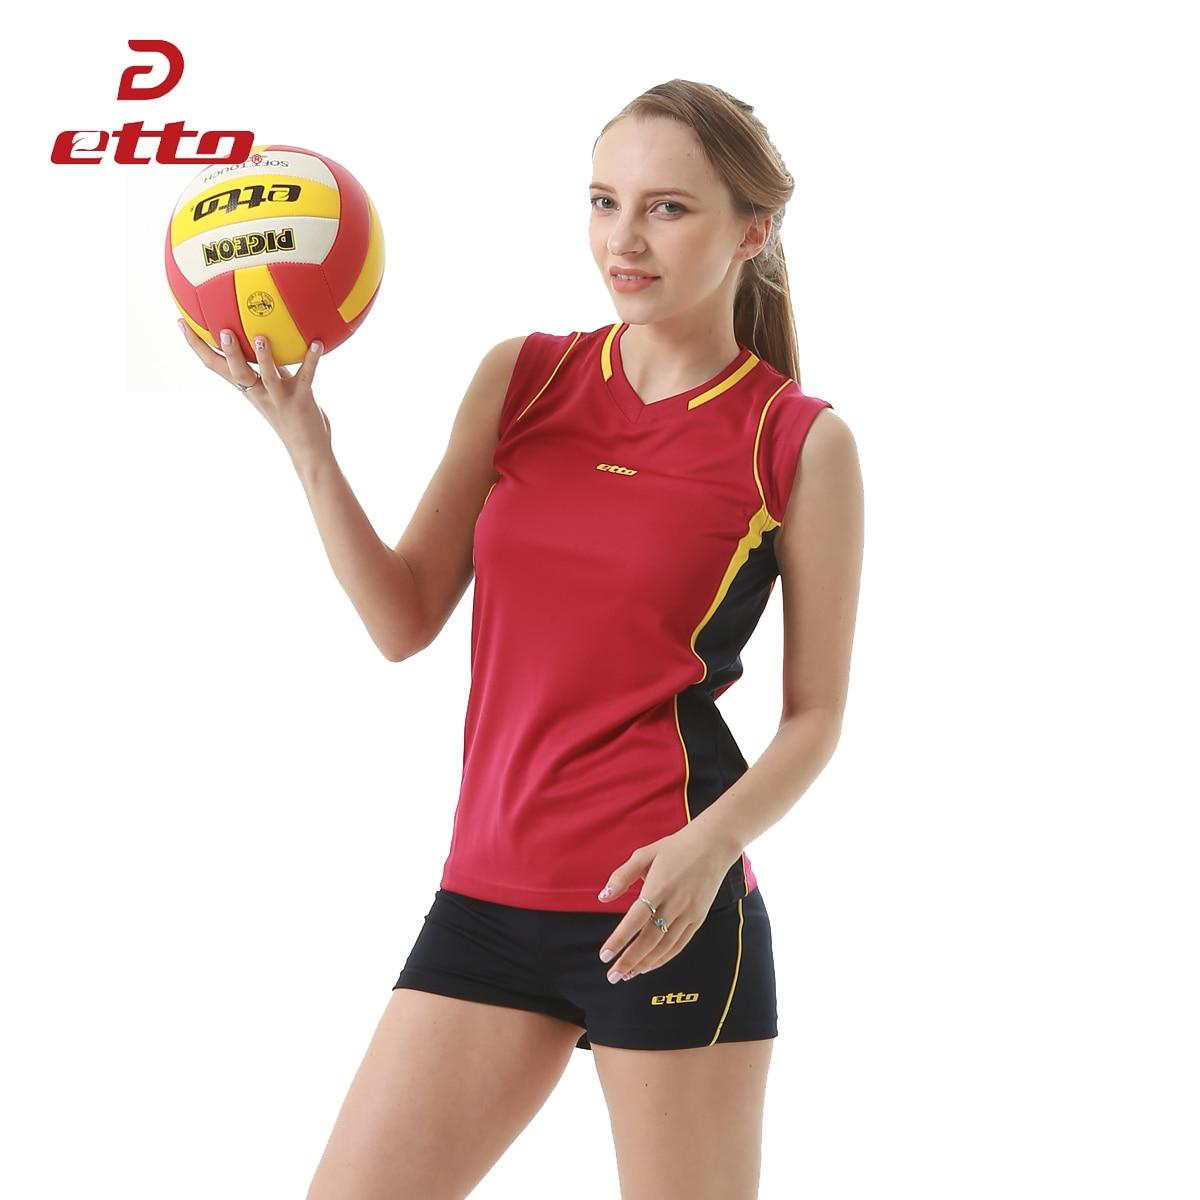 Etto 2018 New Professional Women Volleyball Jerseys Uniforms Sportwear Suit Female Volleyball Sleeveless Training Kits HXB008